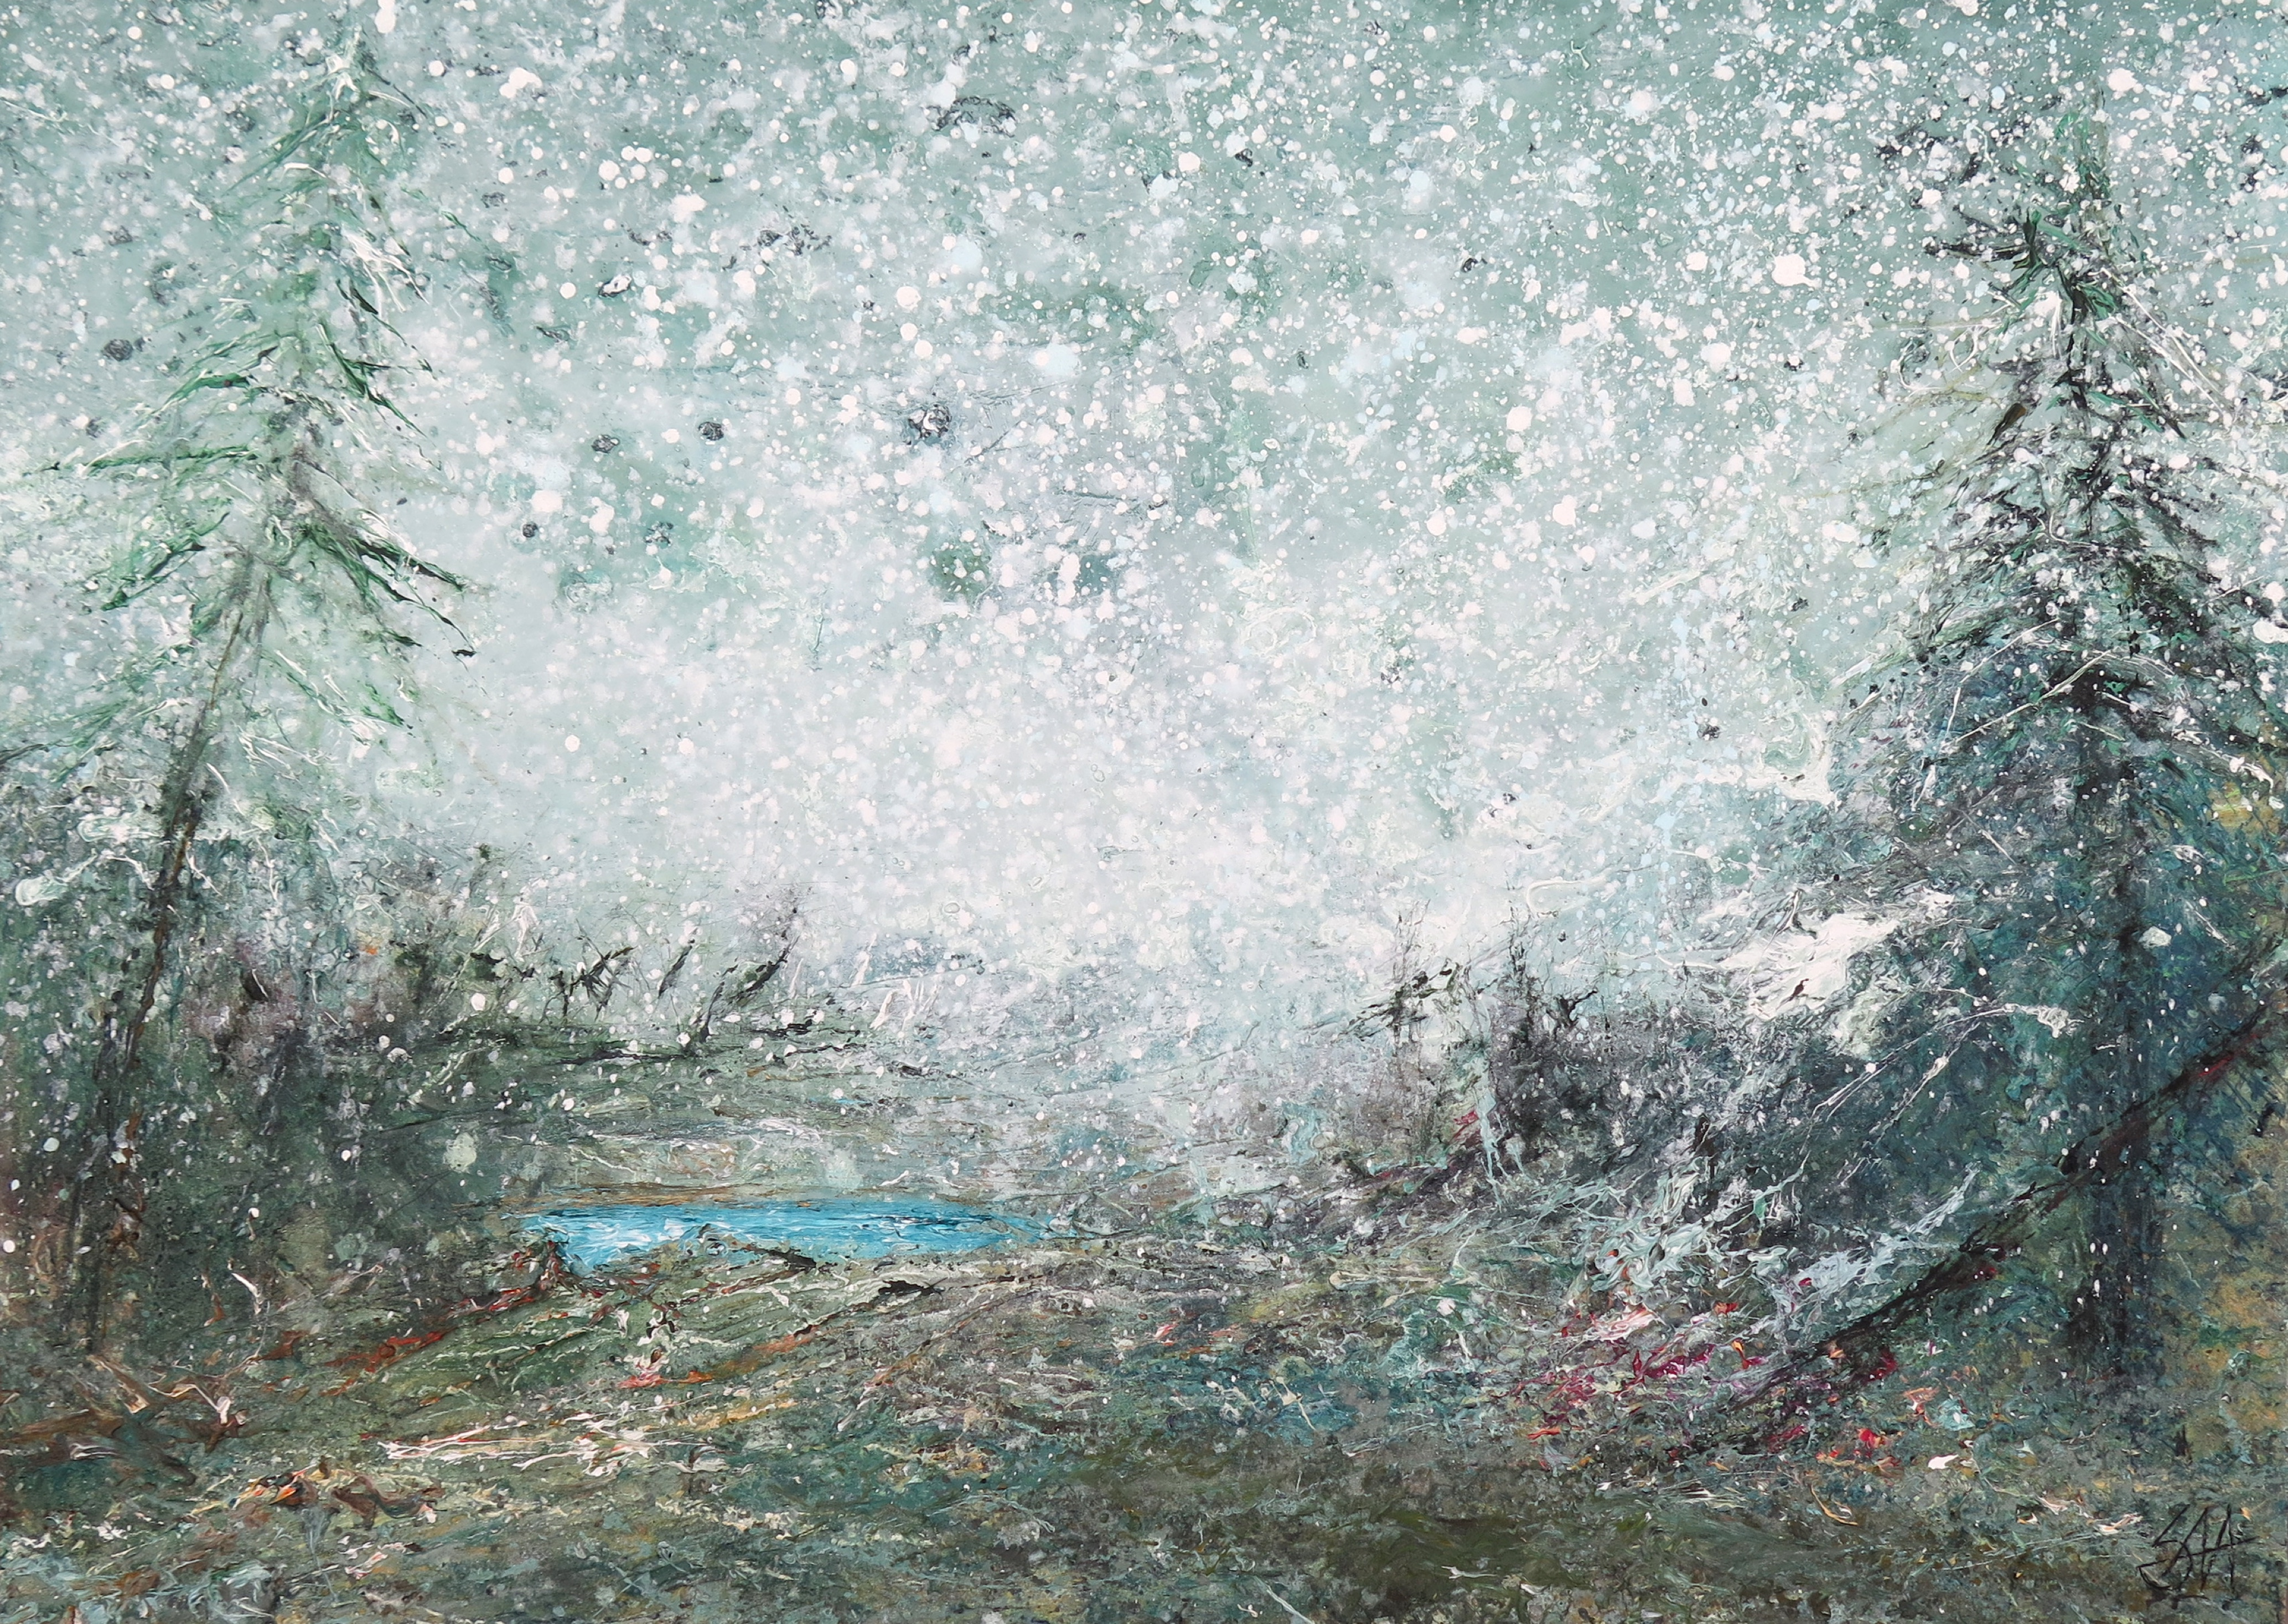 Vinter sne 70x50 cm